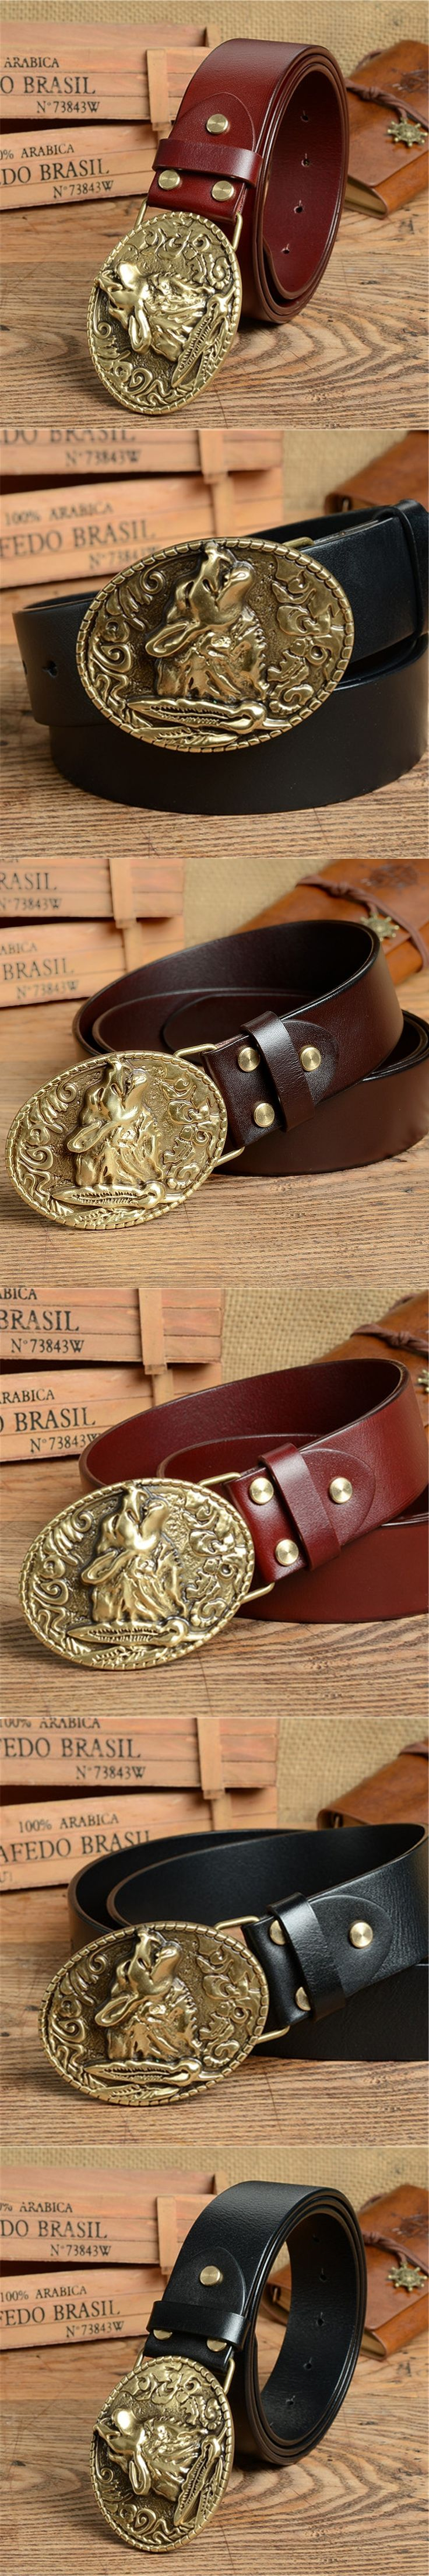 Wolf Belt Buckle Mens Belts Luxury Men Belt Genuine Leather Cowboy Jeans Belt Ceinture Homme Male Strap Cinturones MBT0386